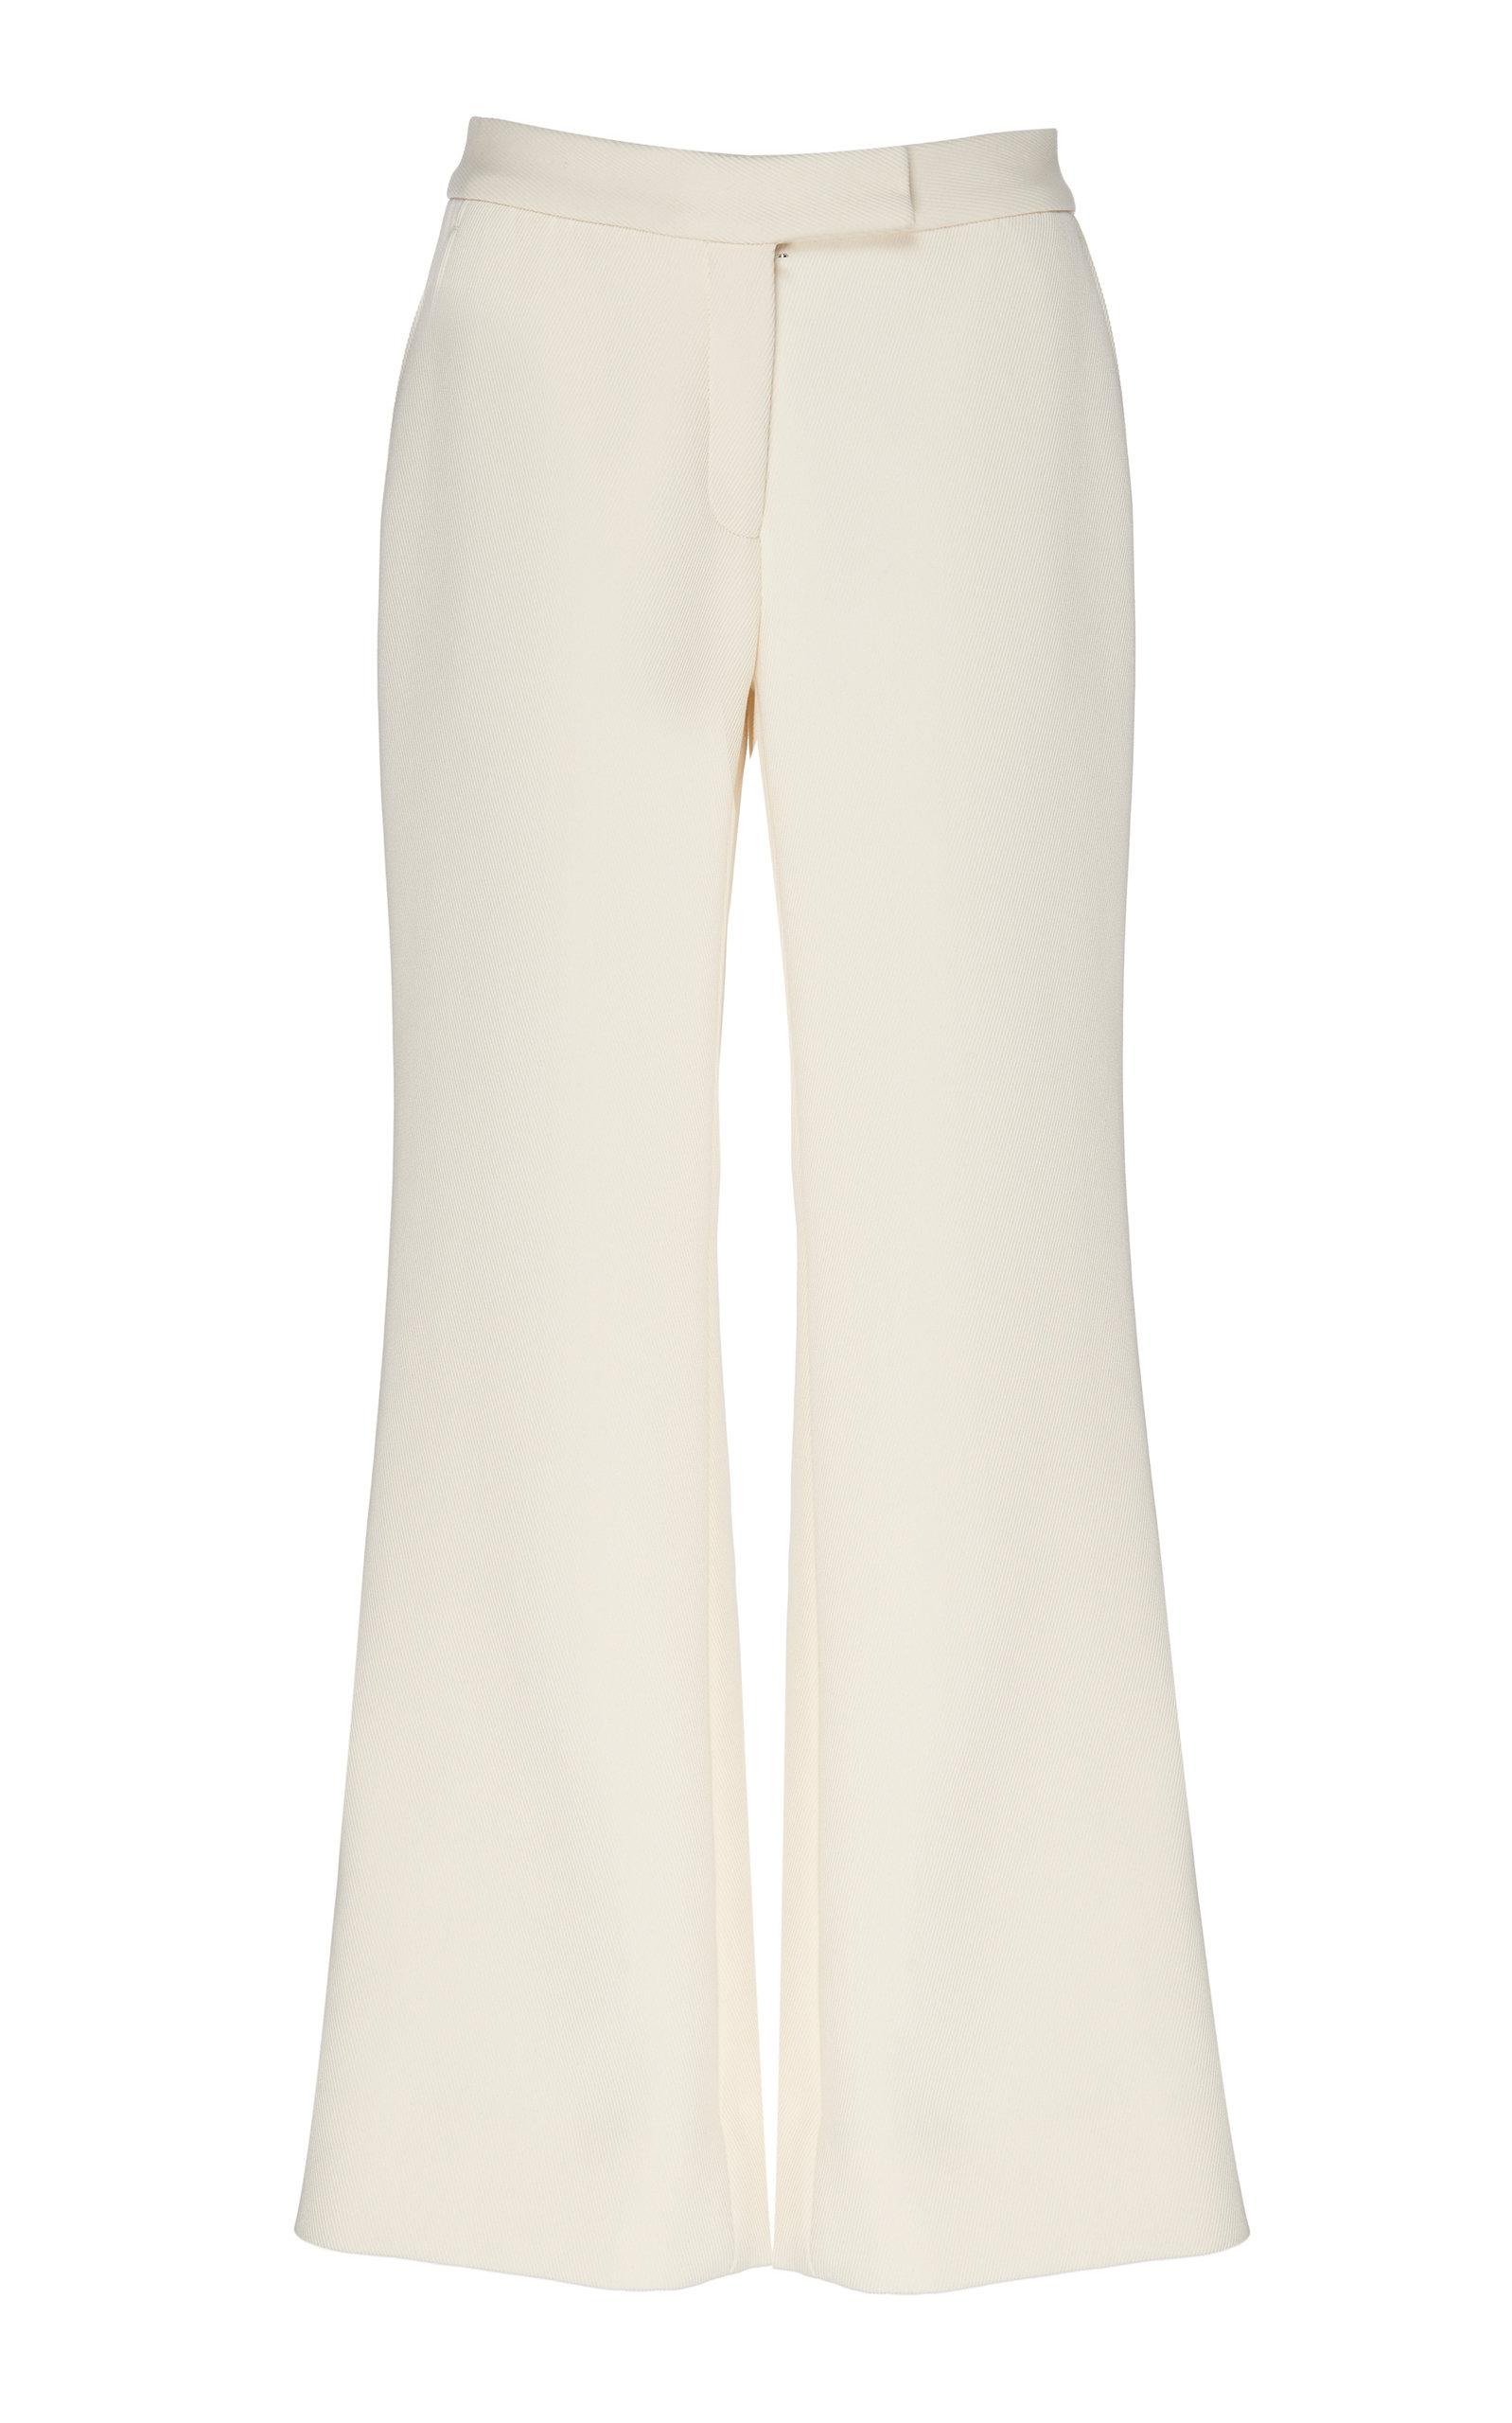 Marina Moscone | Marina Moscone Cotton-Blend Wide-Leg Pants | Clouty